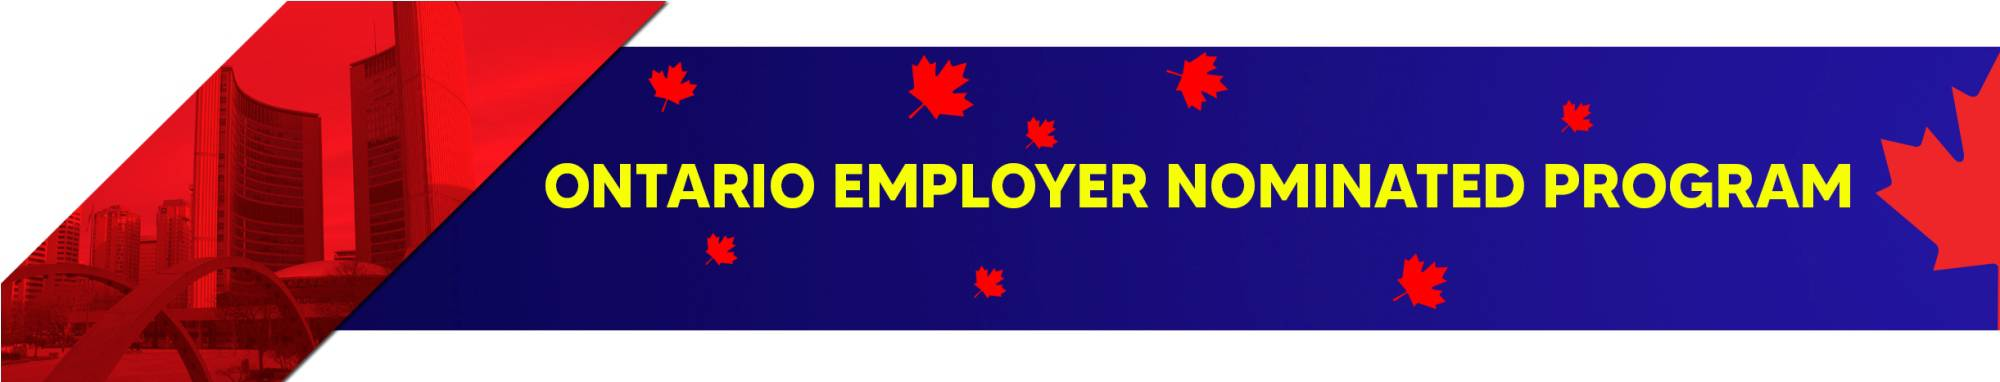 Ontario immigration program